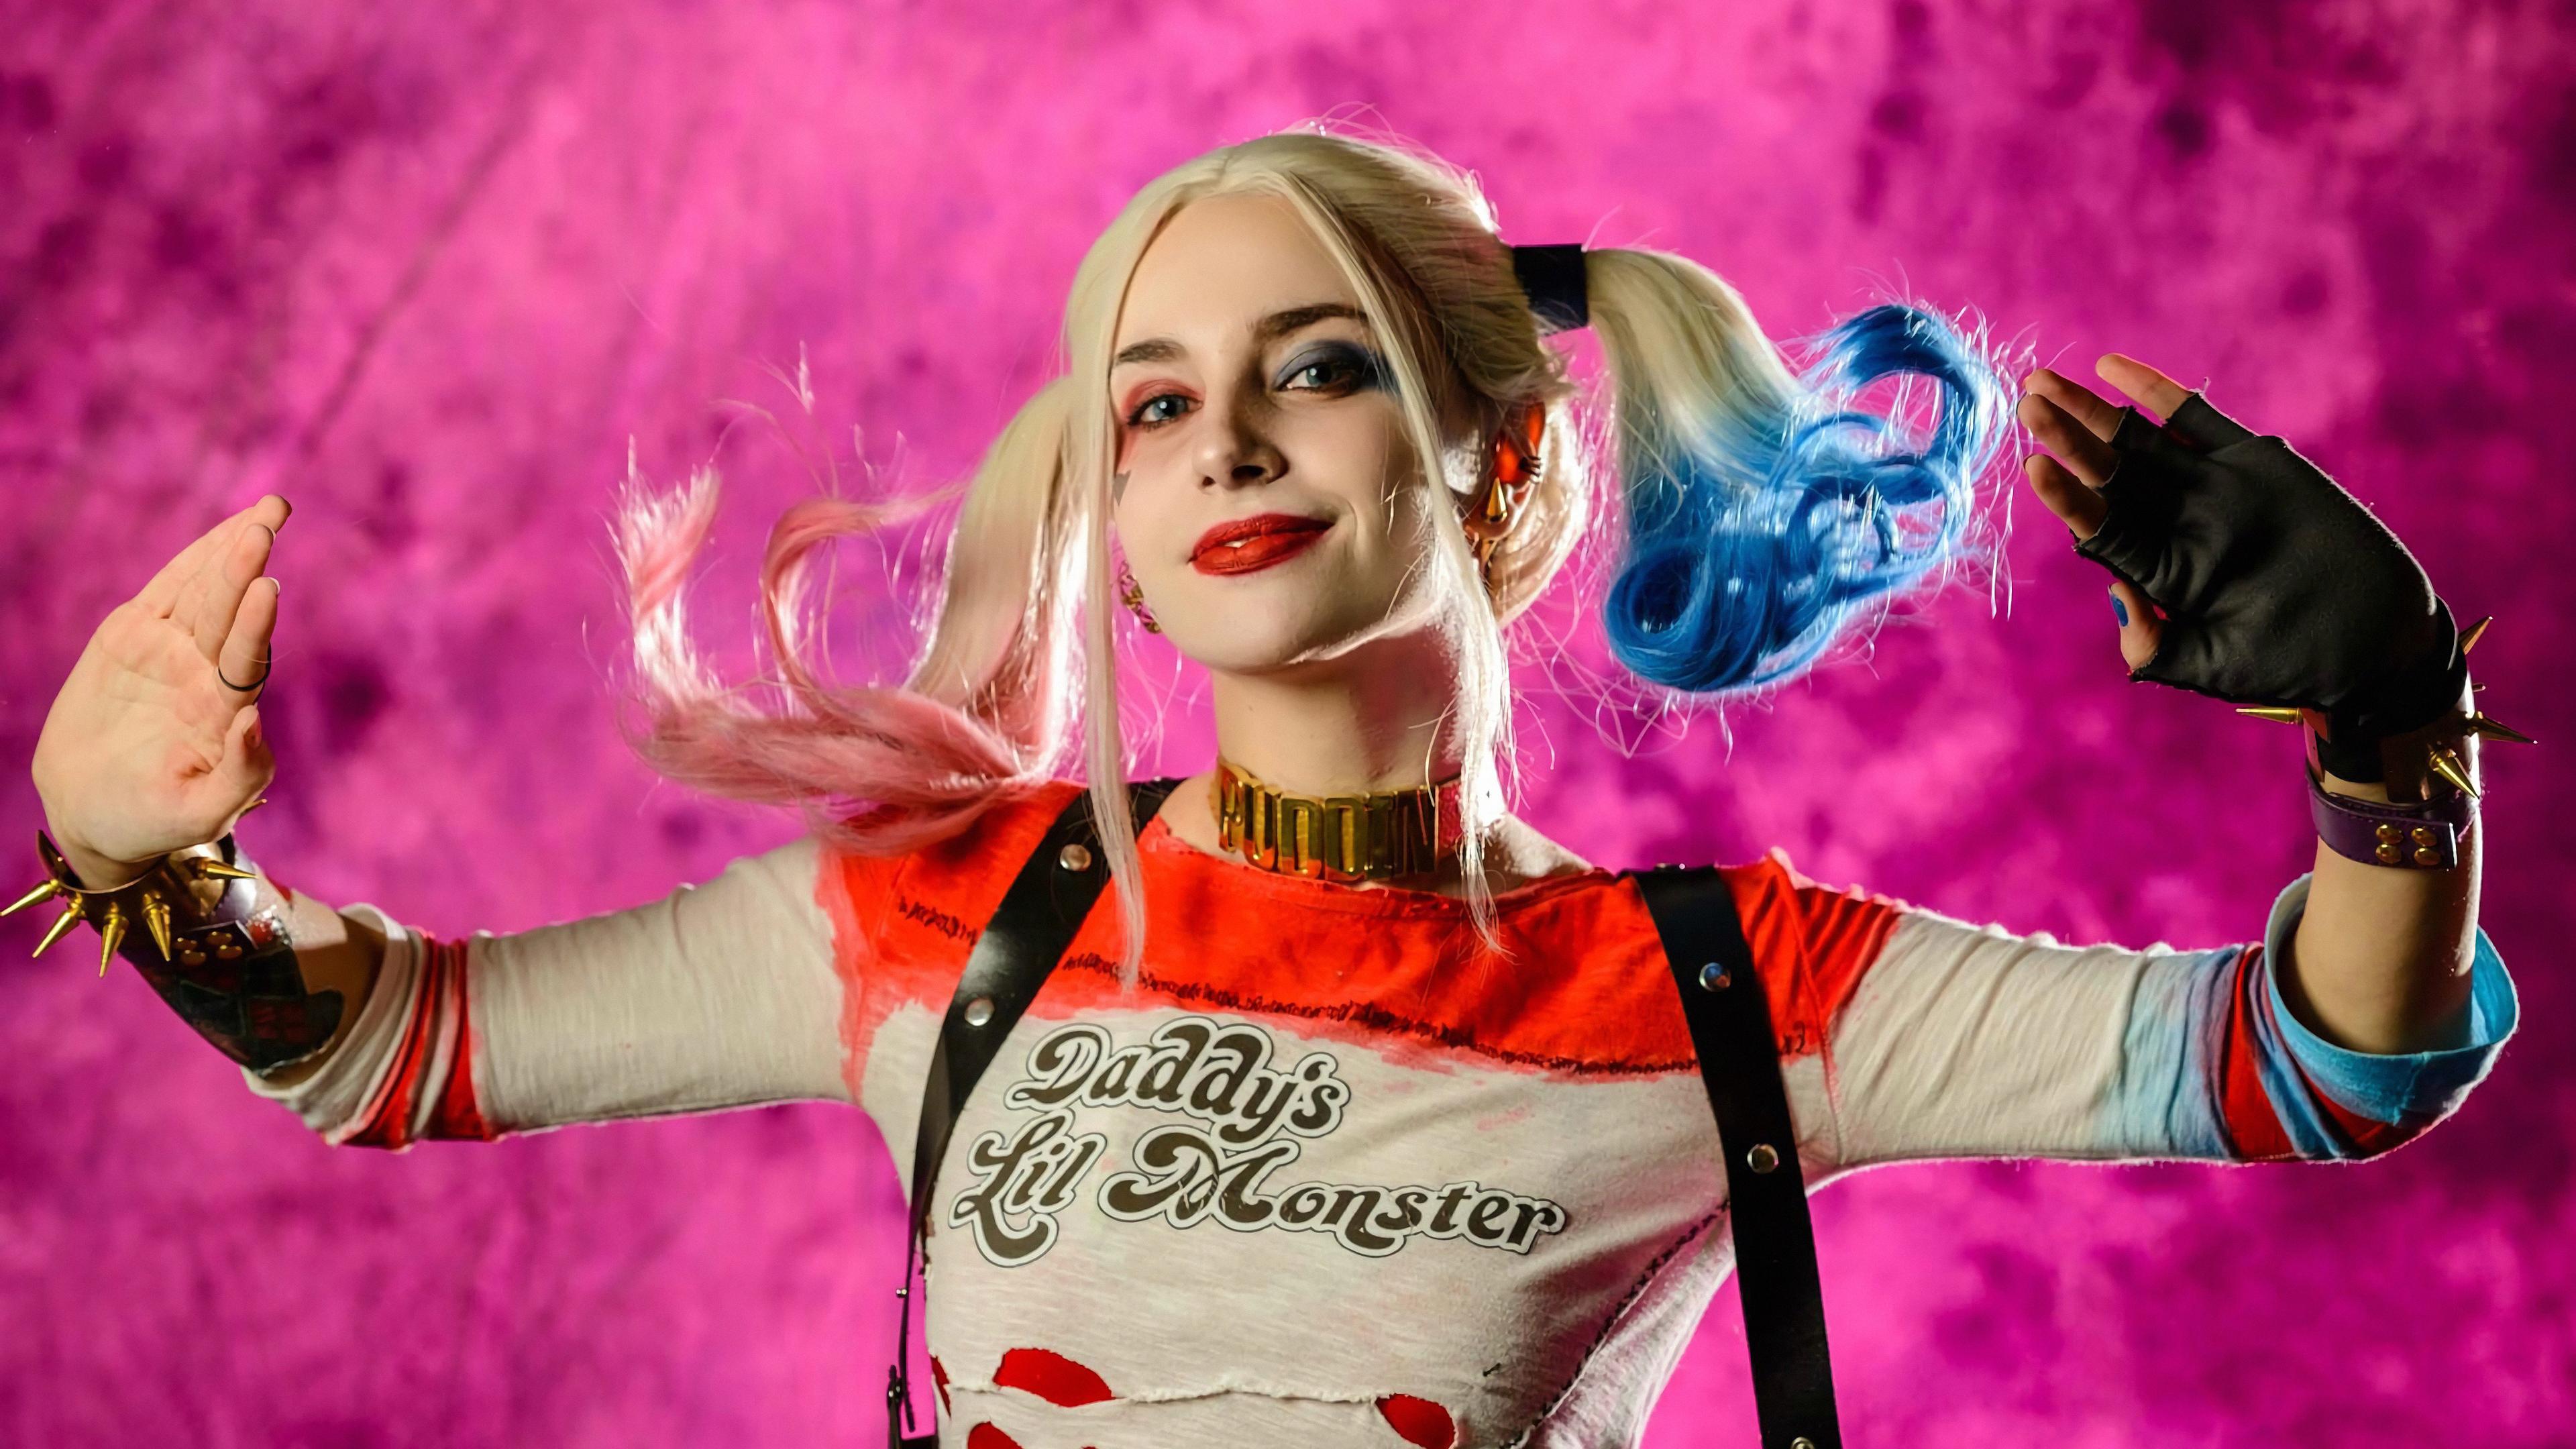 harley quinn cosplay new 1569186659 - Harley Quinn Cosplay New - superheroes wallpapers, hd-wallpapers, harley quinn wallpapers, deviantart wallpapers, cosplay wallpapers, artist wallpapers, 4k-wallpapers